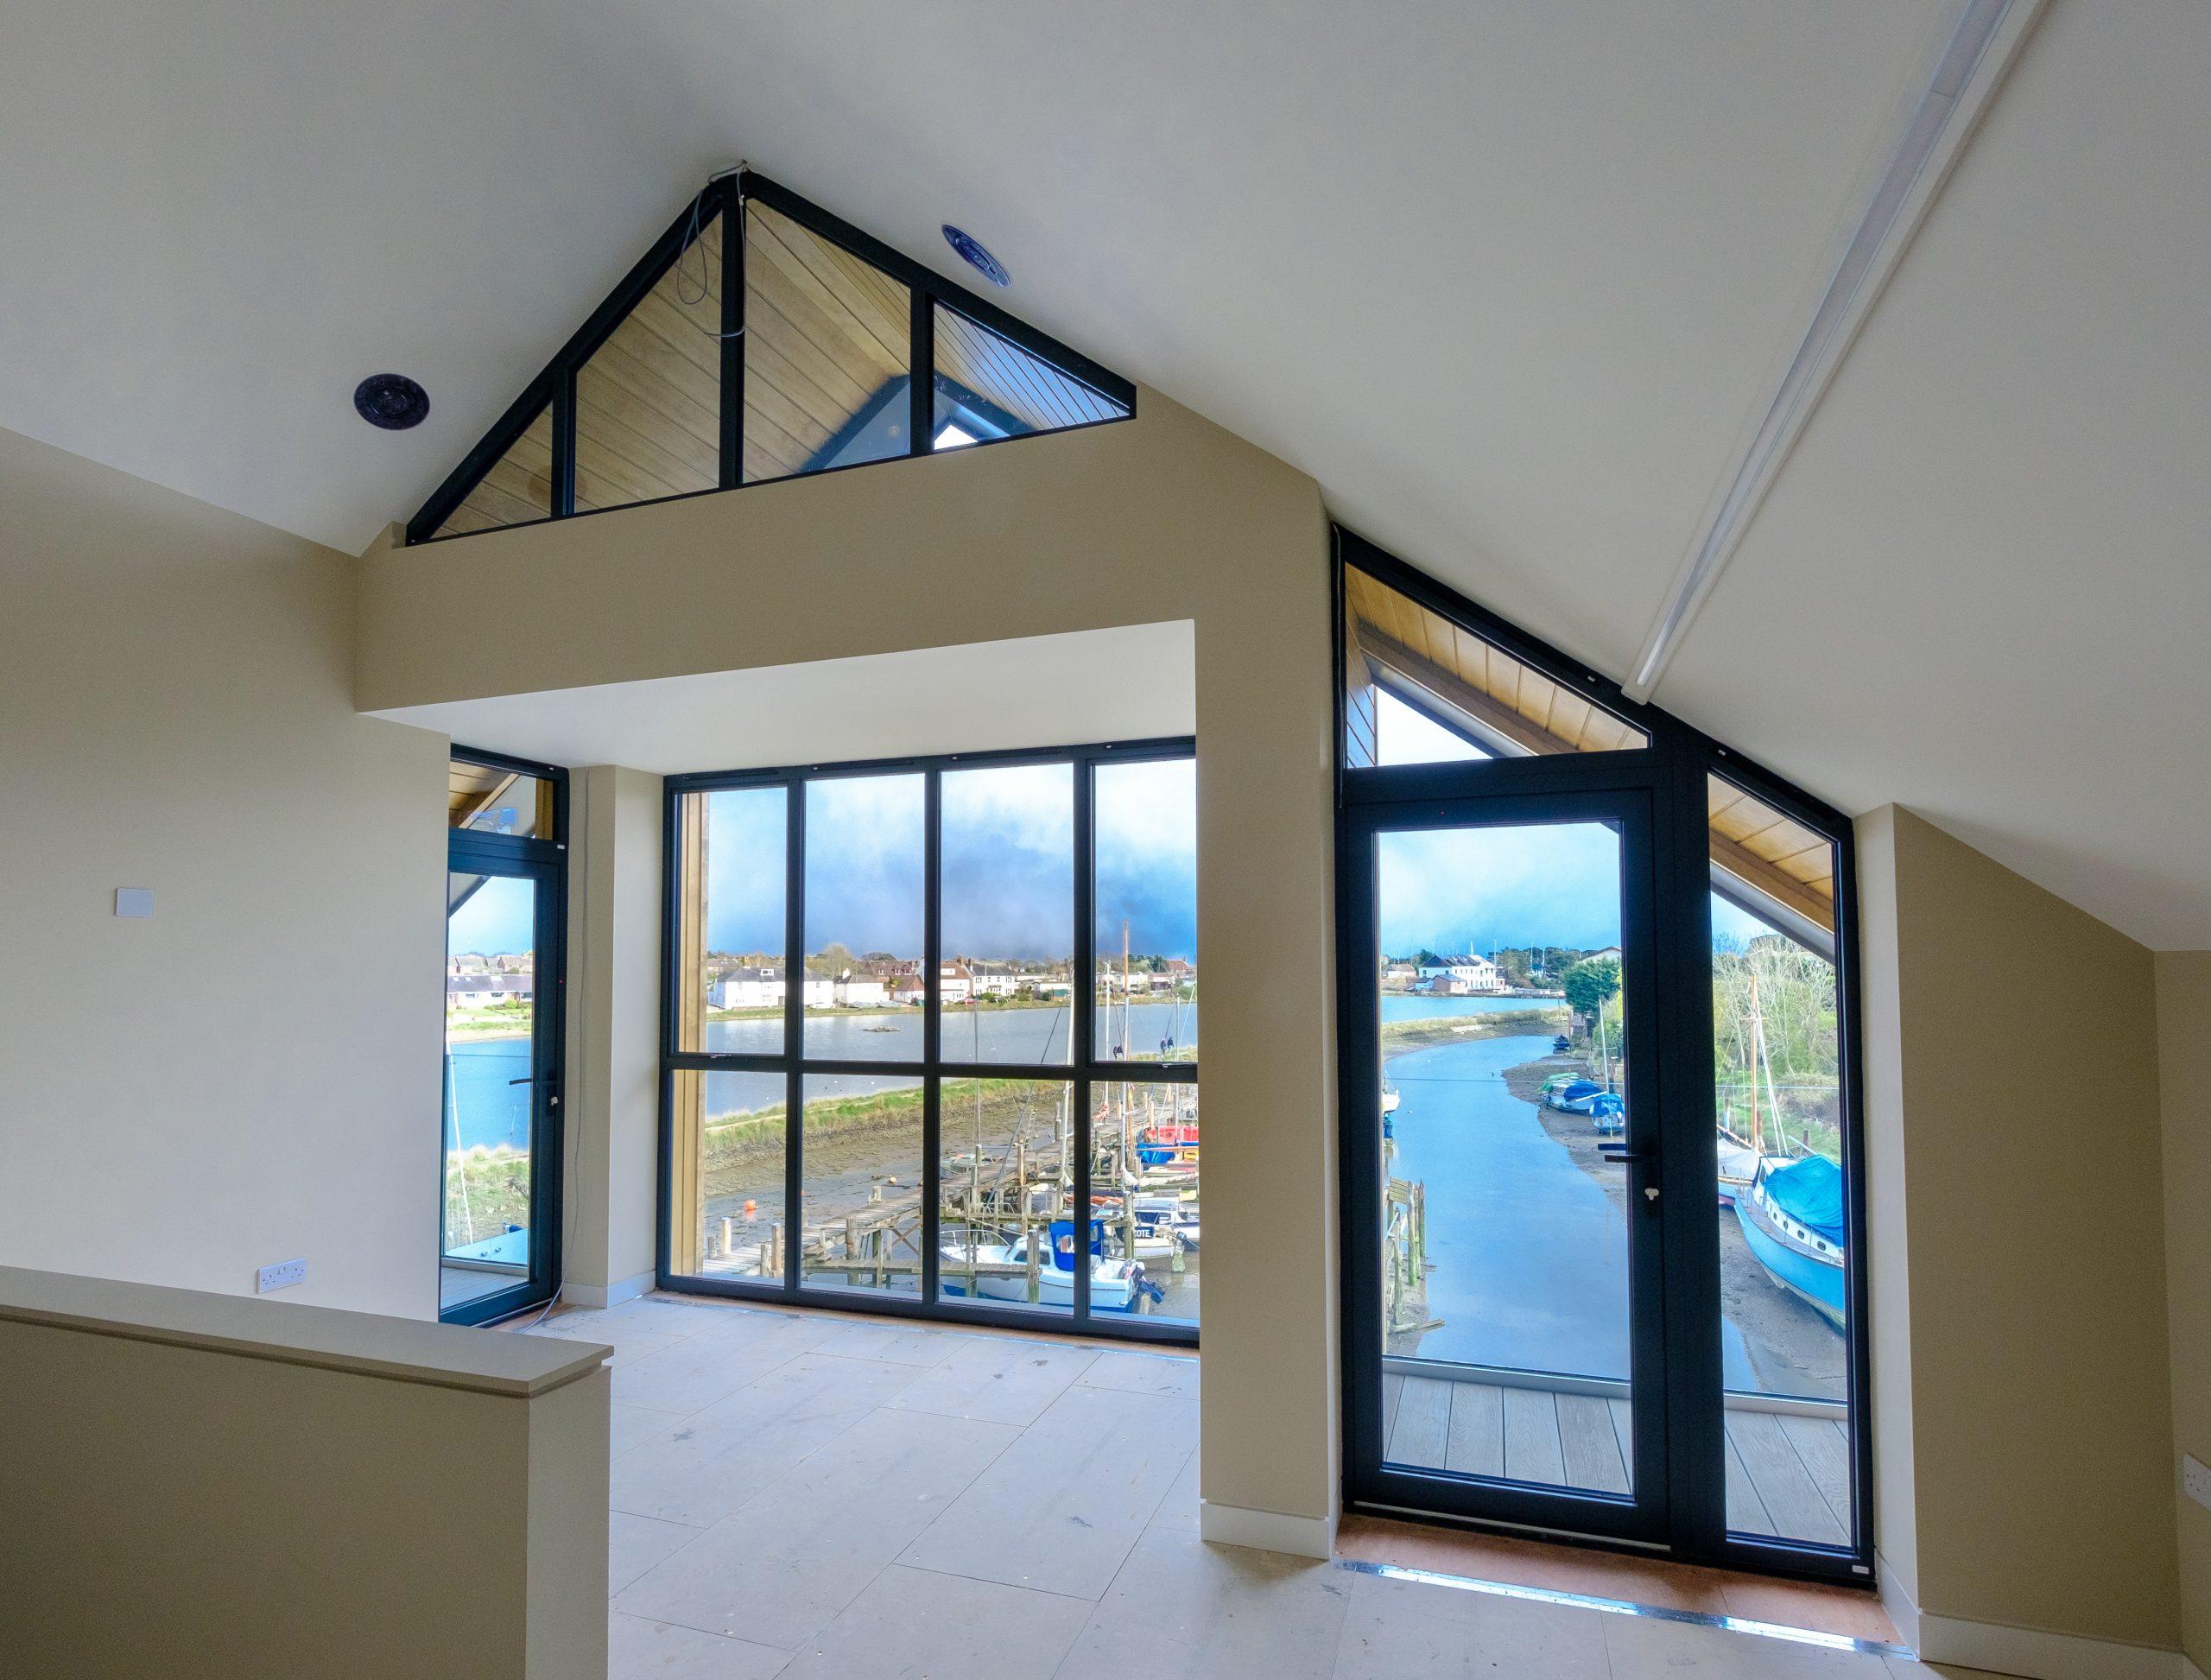 aluminium slim sliding doors and gable end windows with marine grade aluminium framing